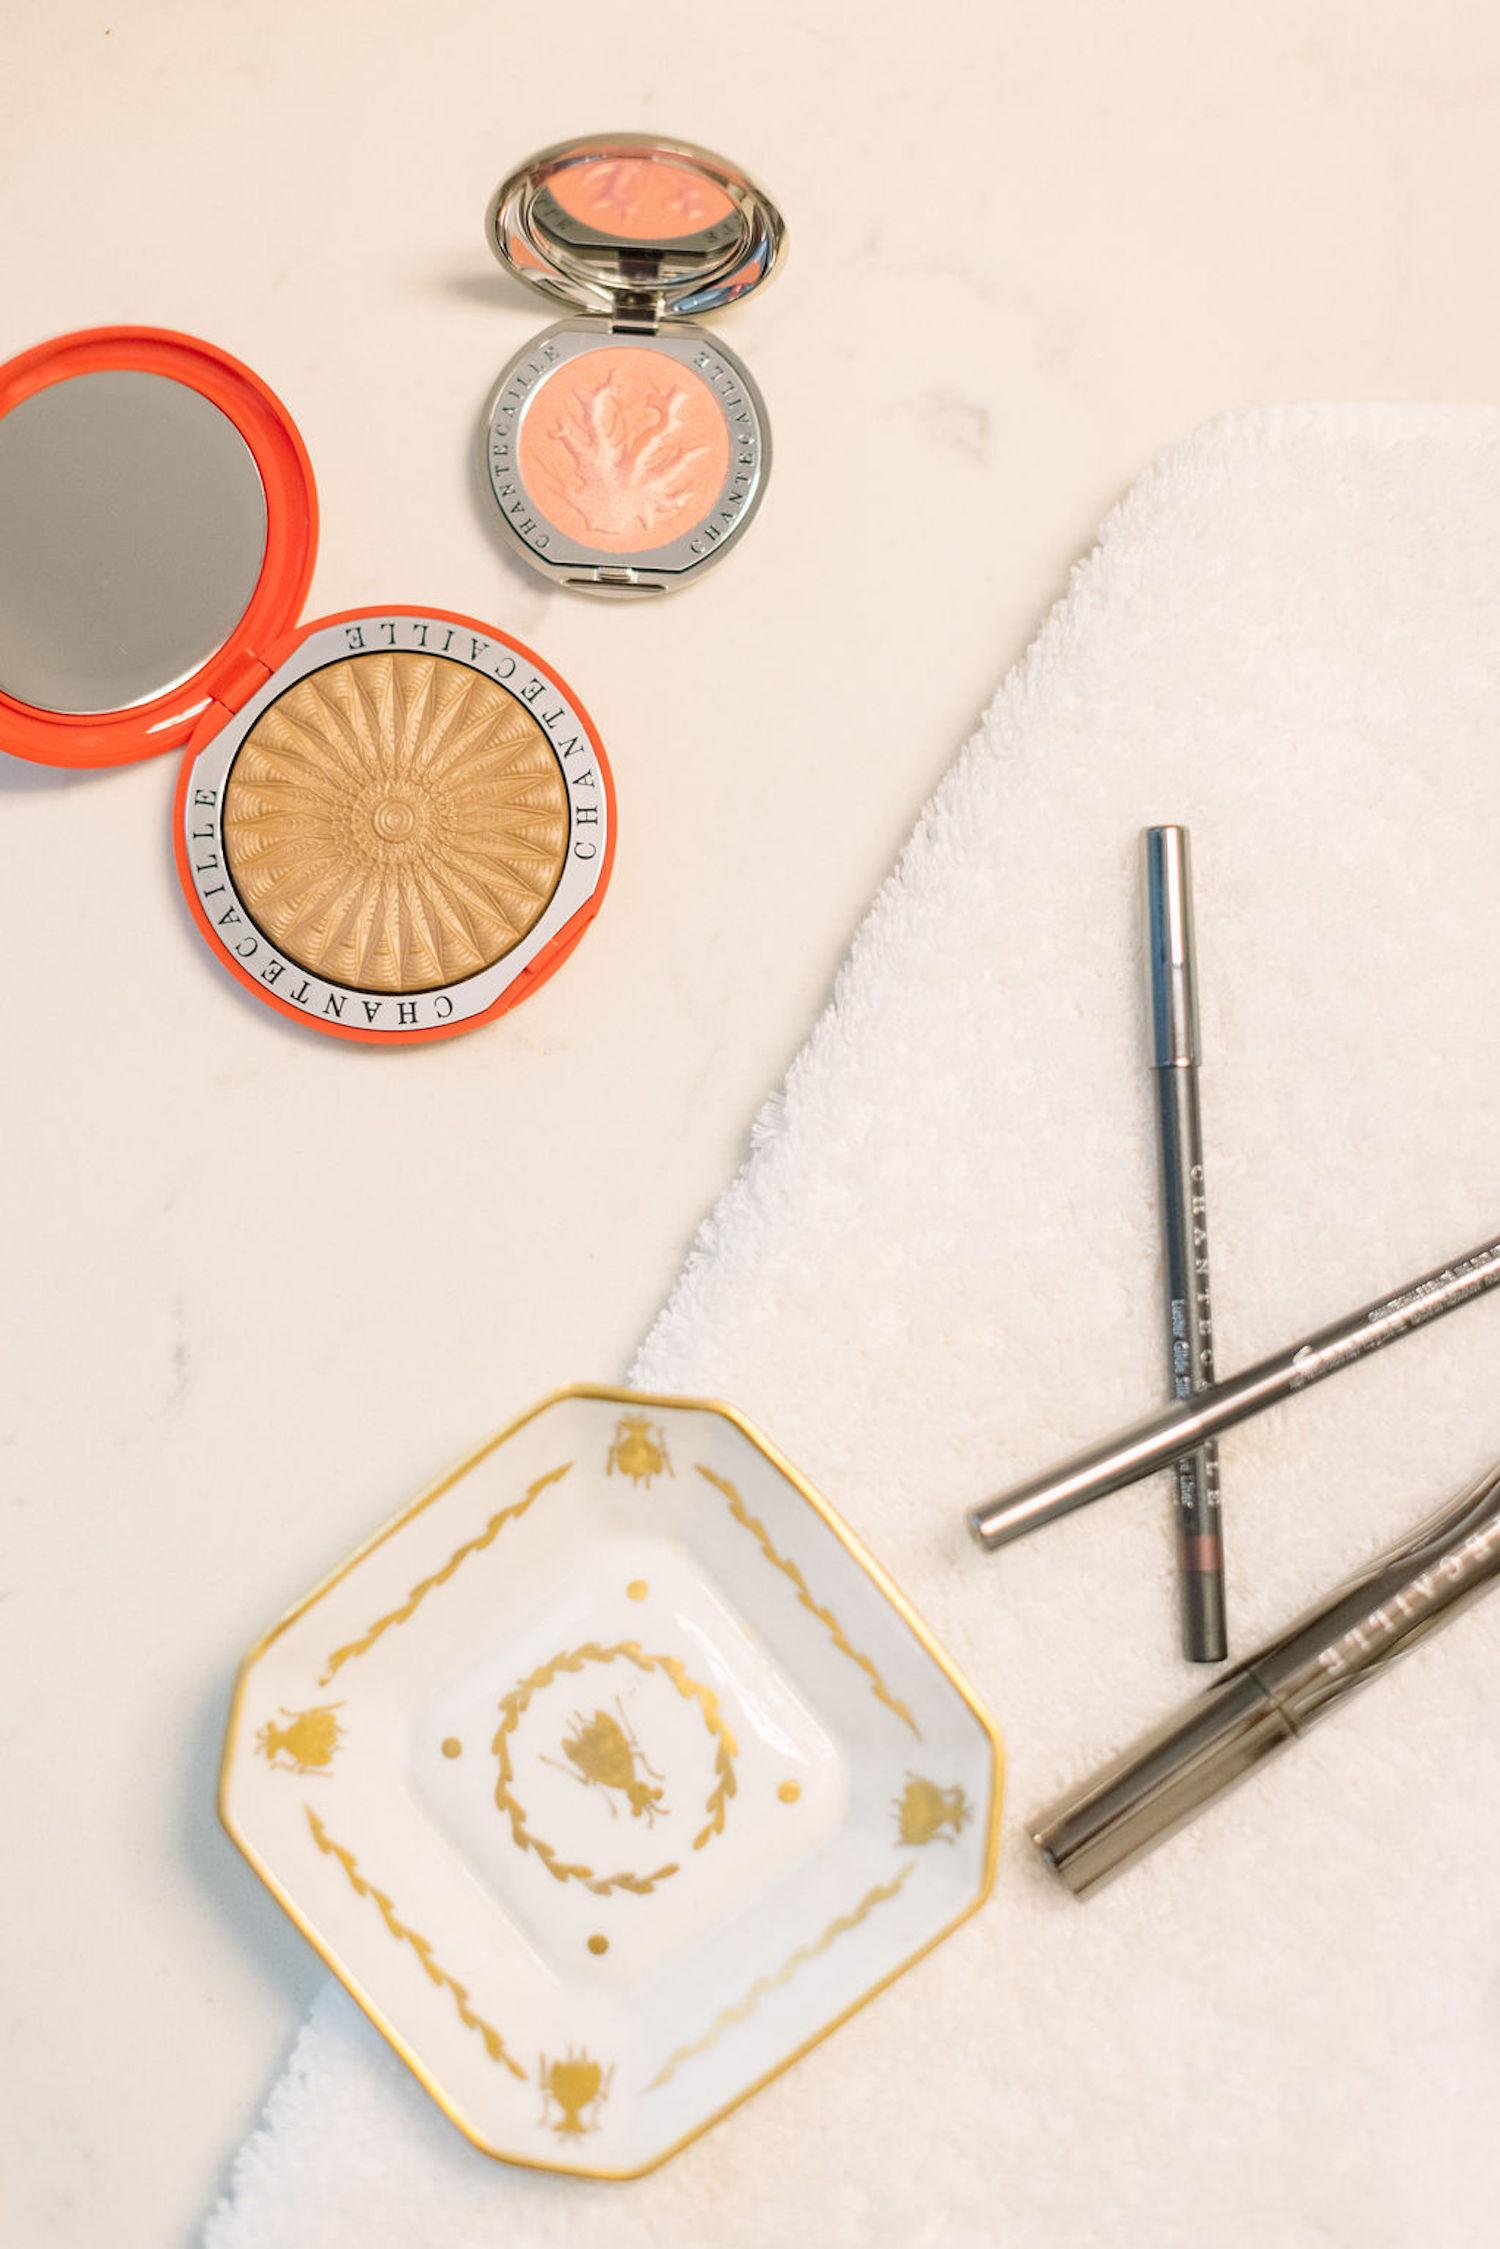 Chantecaille makeup review | An Easy Beachy-Bronzy Makeup Look for Summer